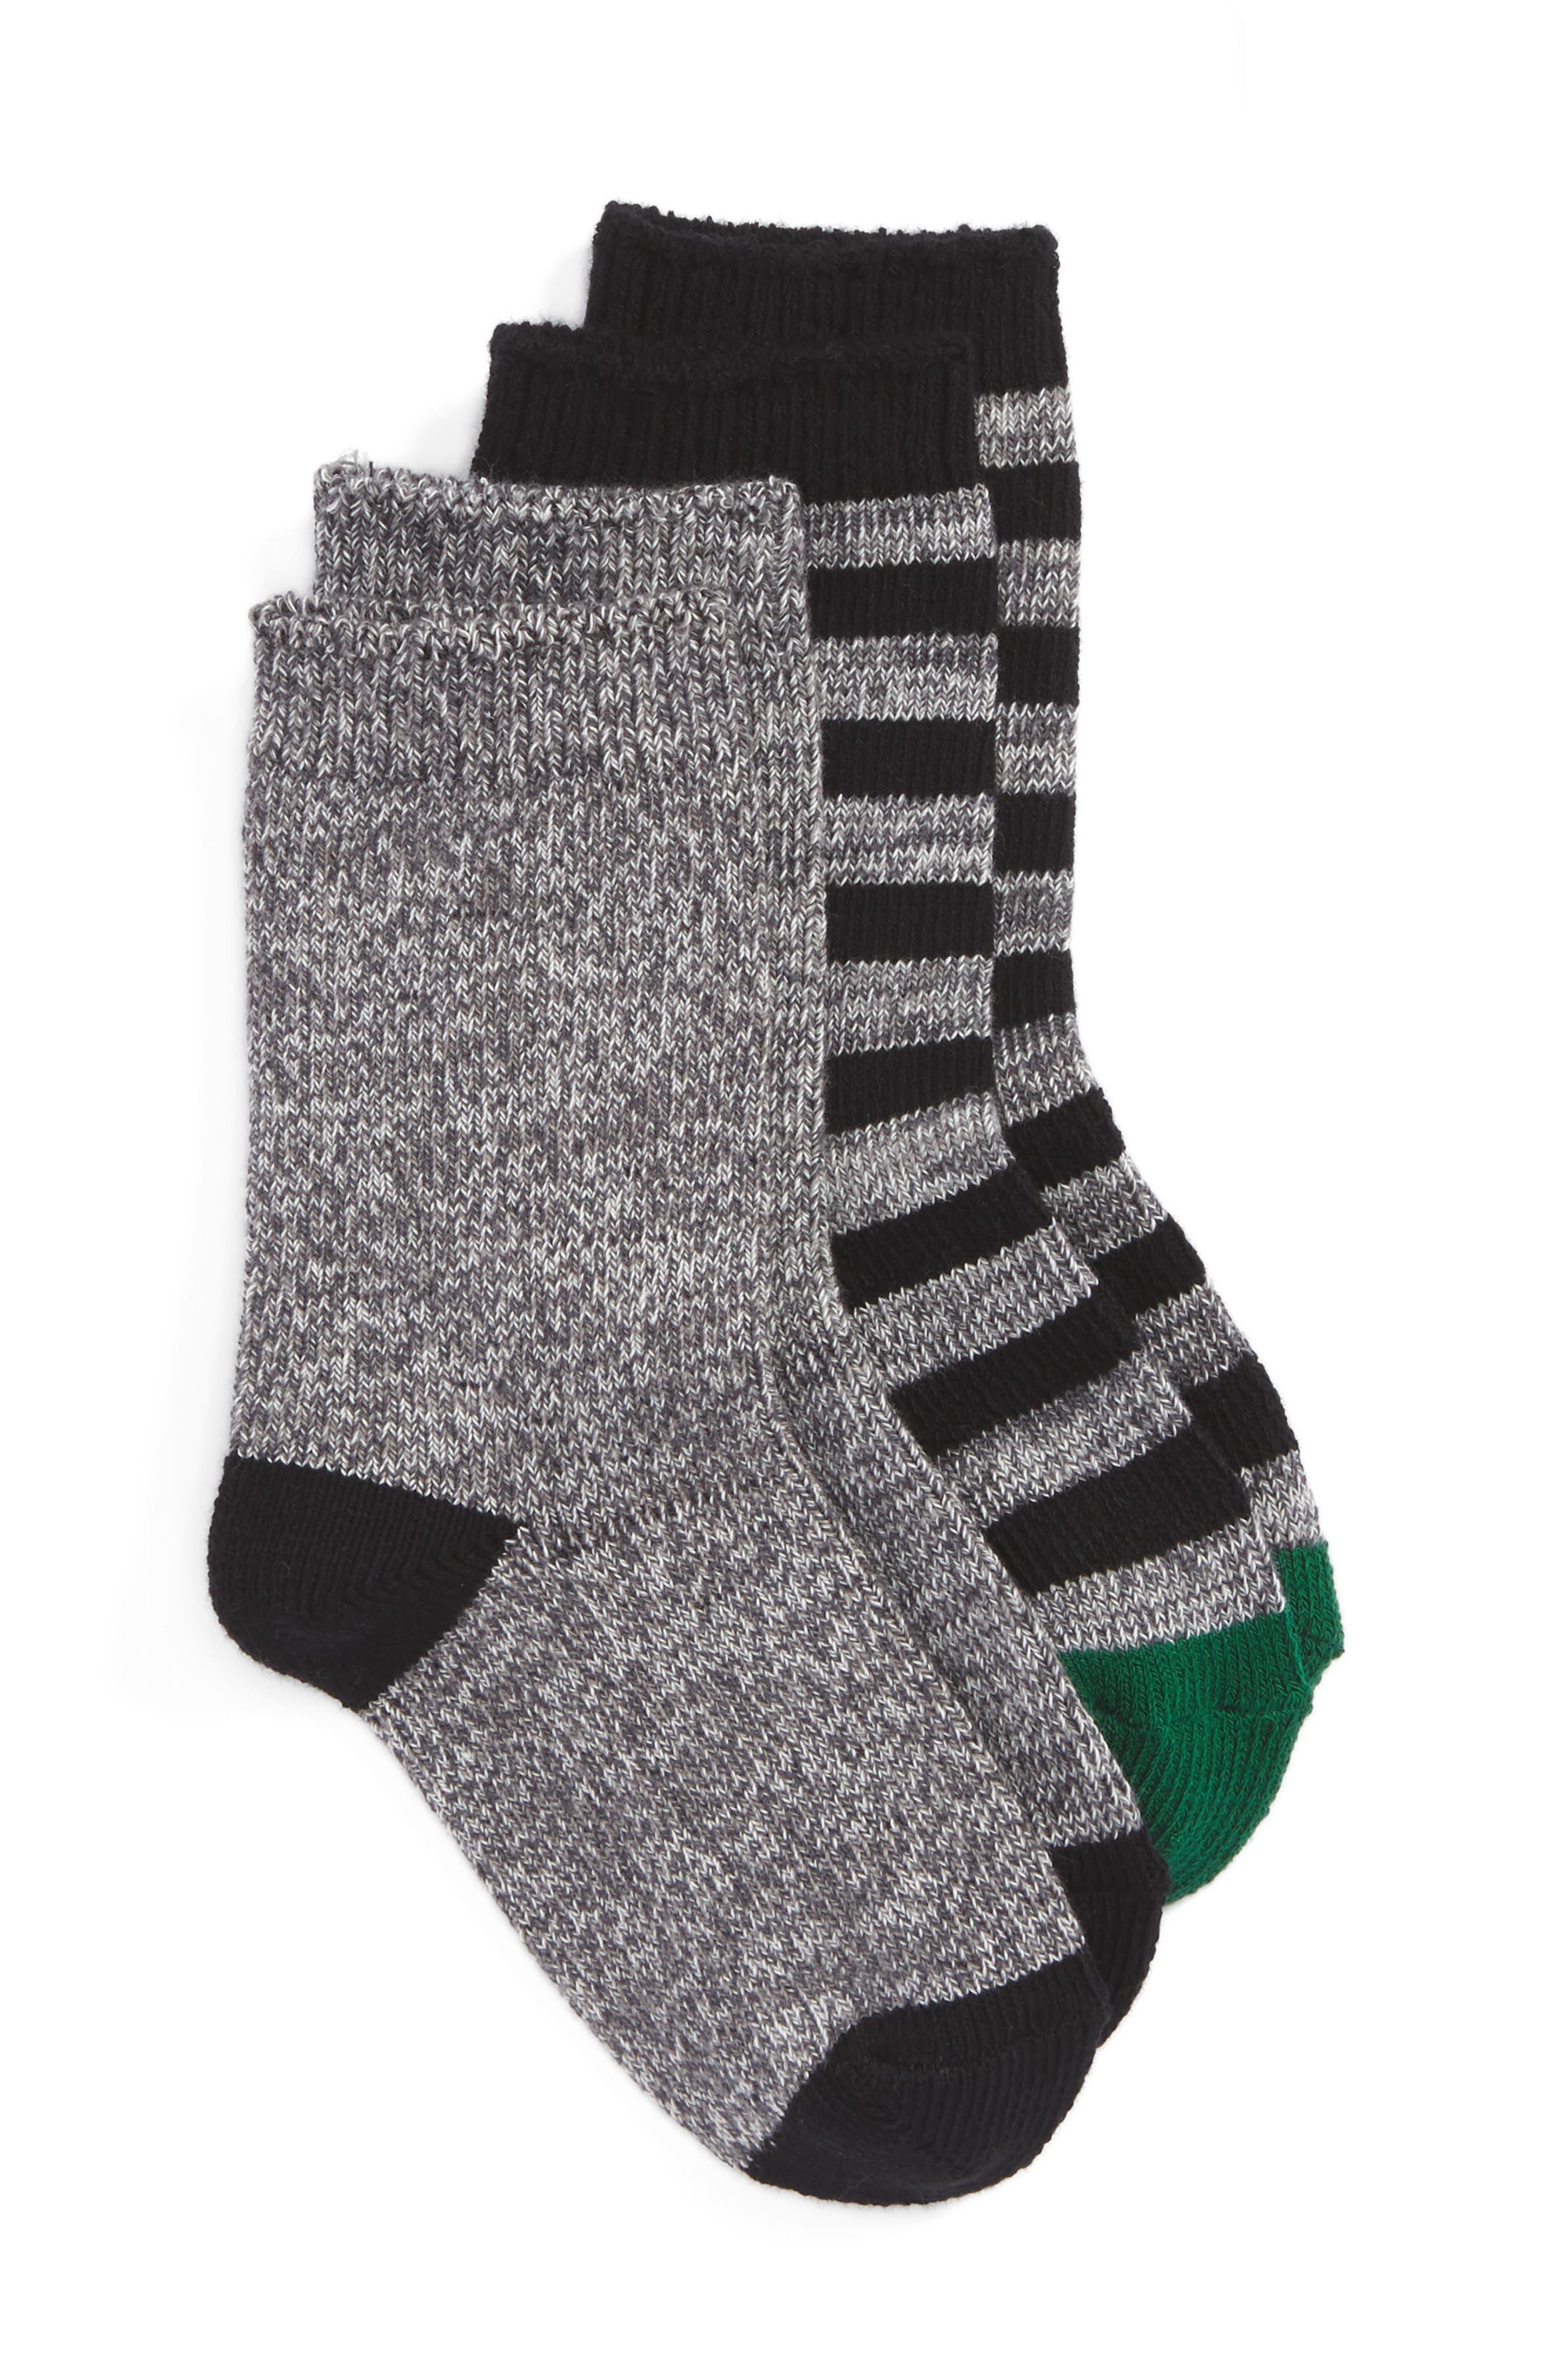 Tucker + Tate Assorted 2-Pack Crew Socks (Toddler, Little Kid & Big Kid)